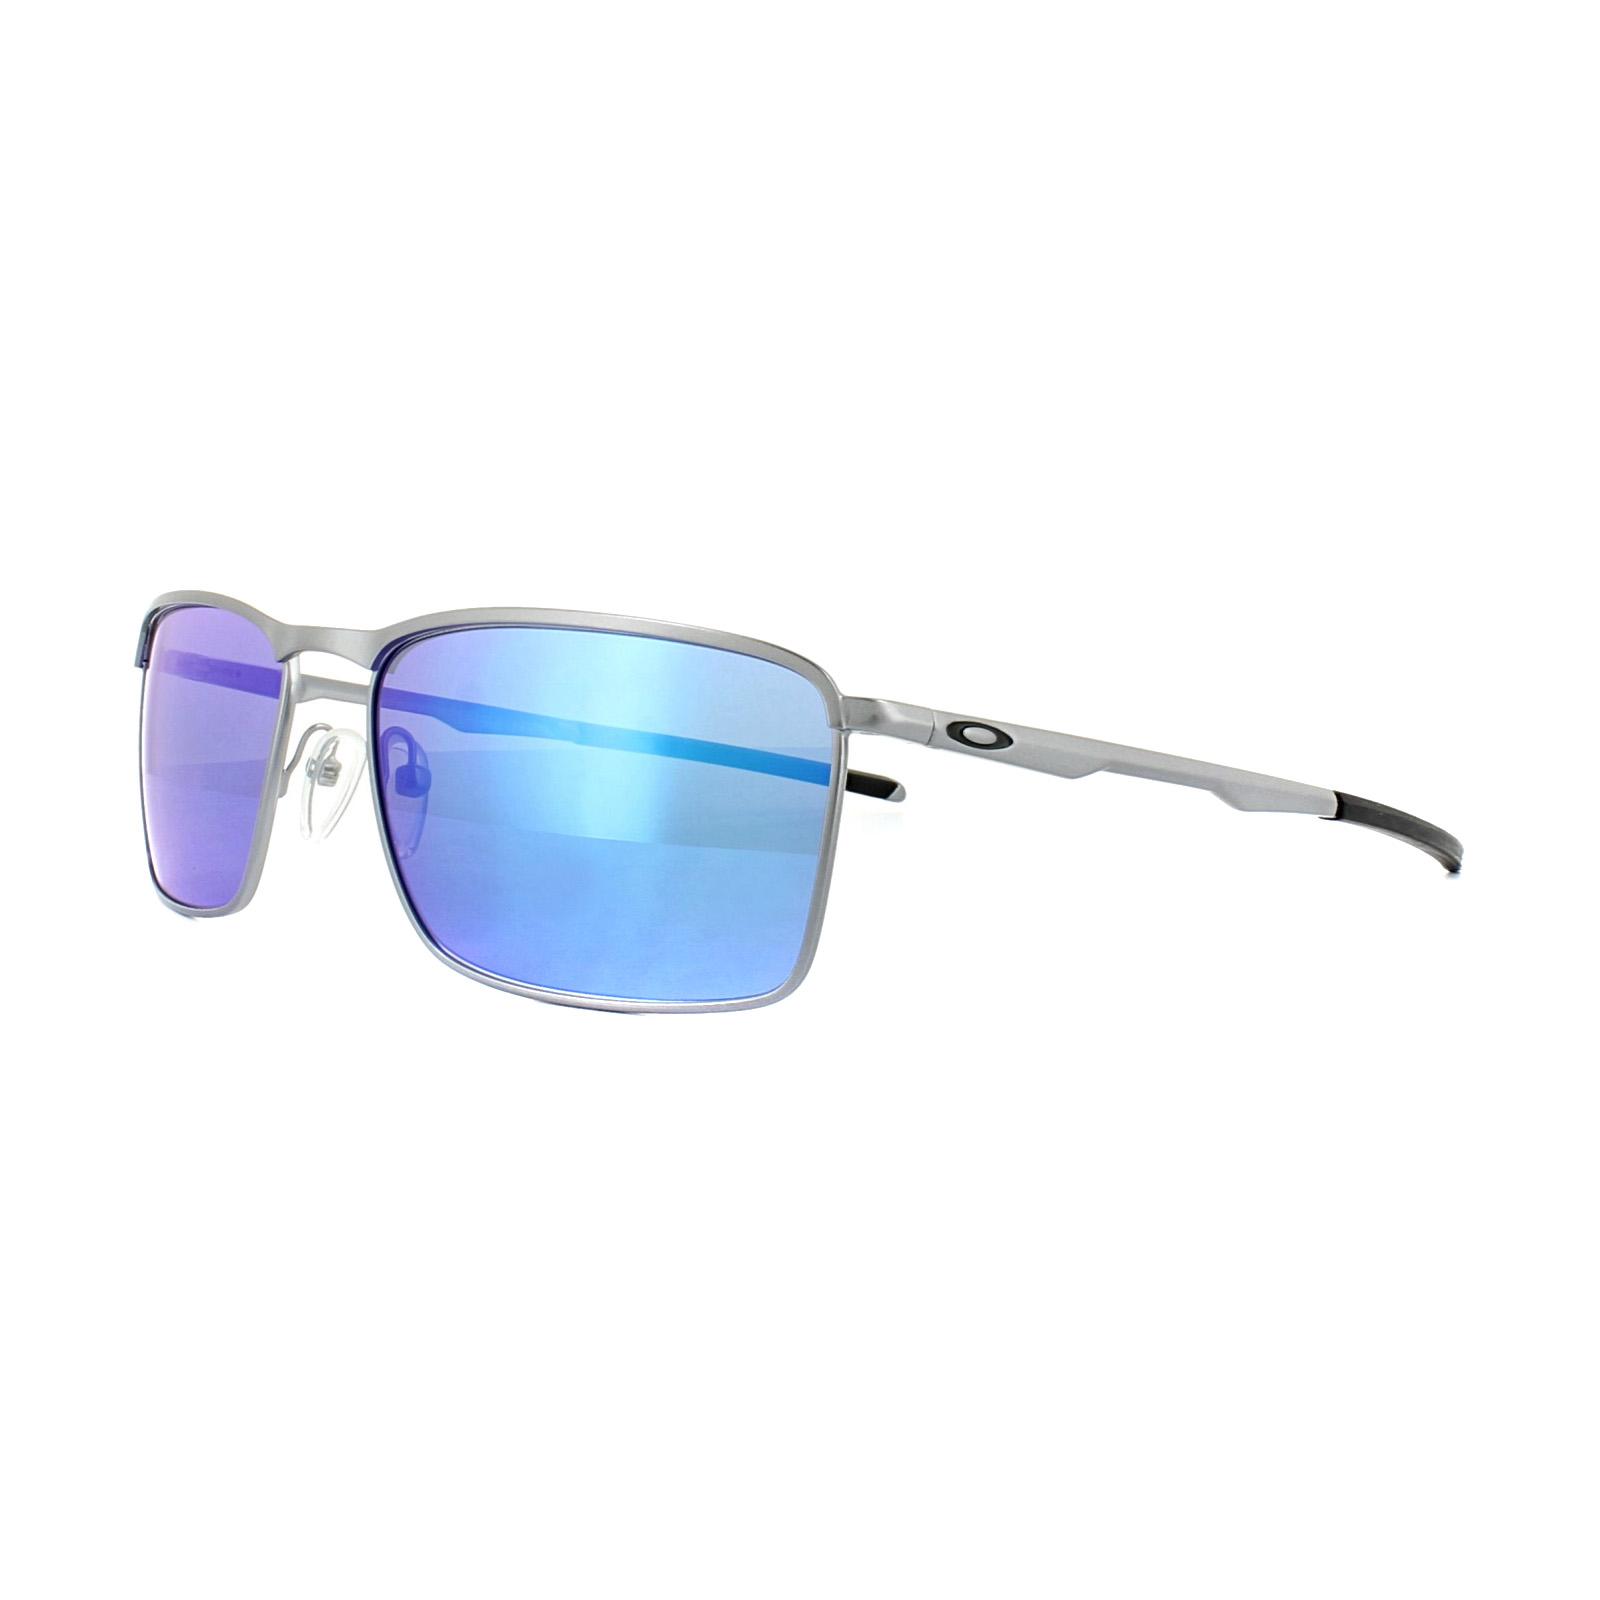 85e4f027456 new arrivals sentinel oakley sunglasses conductor 6 oo4106 09 lead sapphire  iridium 970b5 b2a73